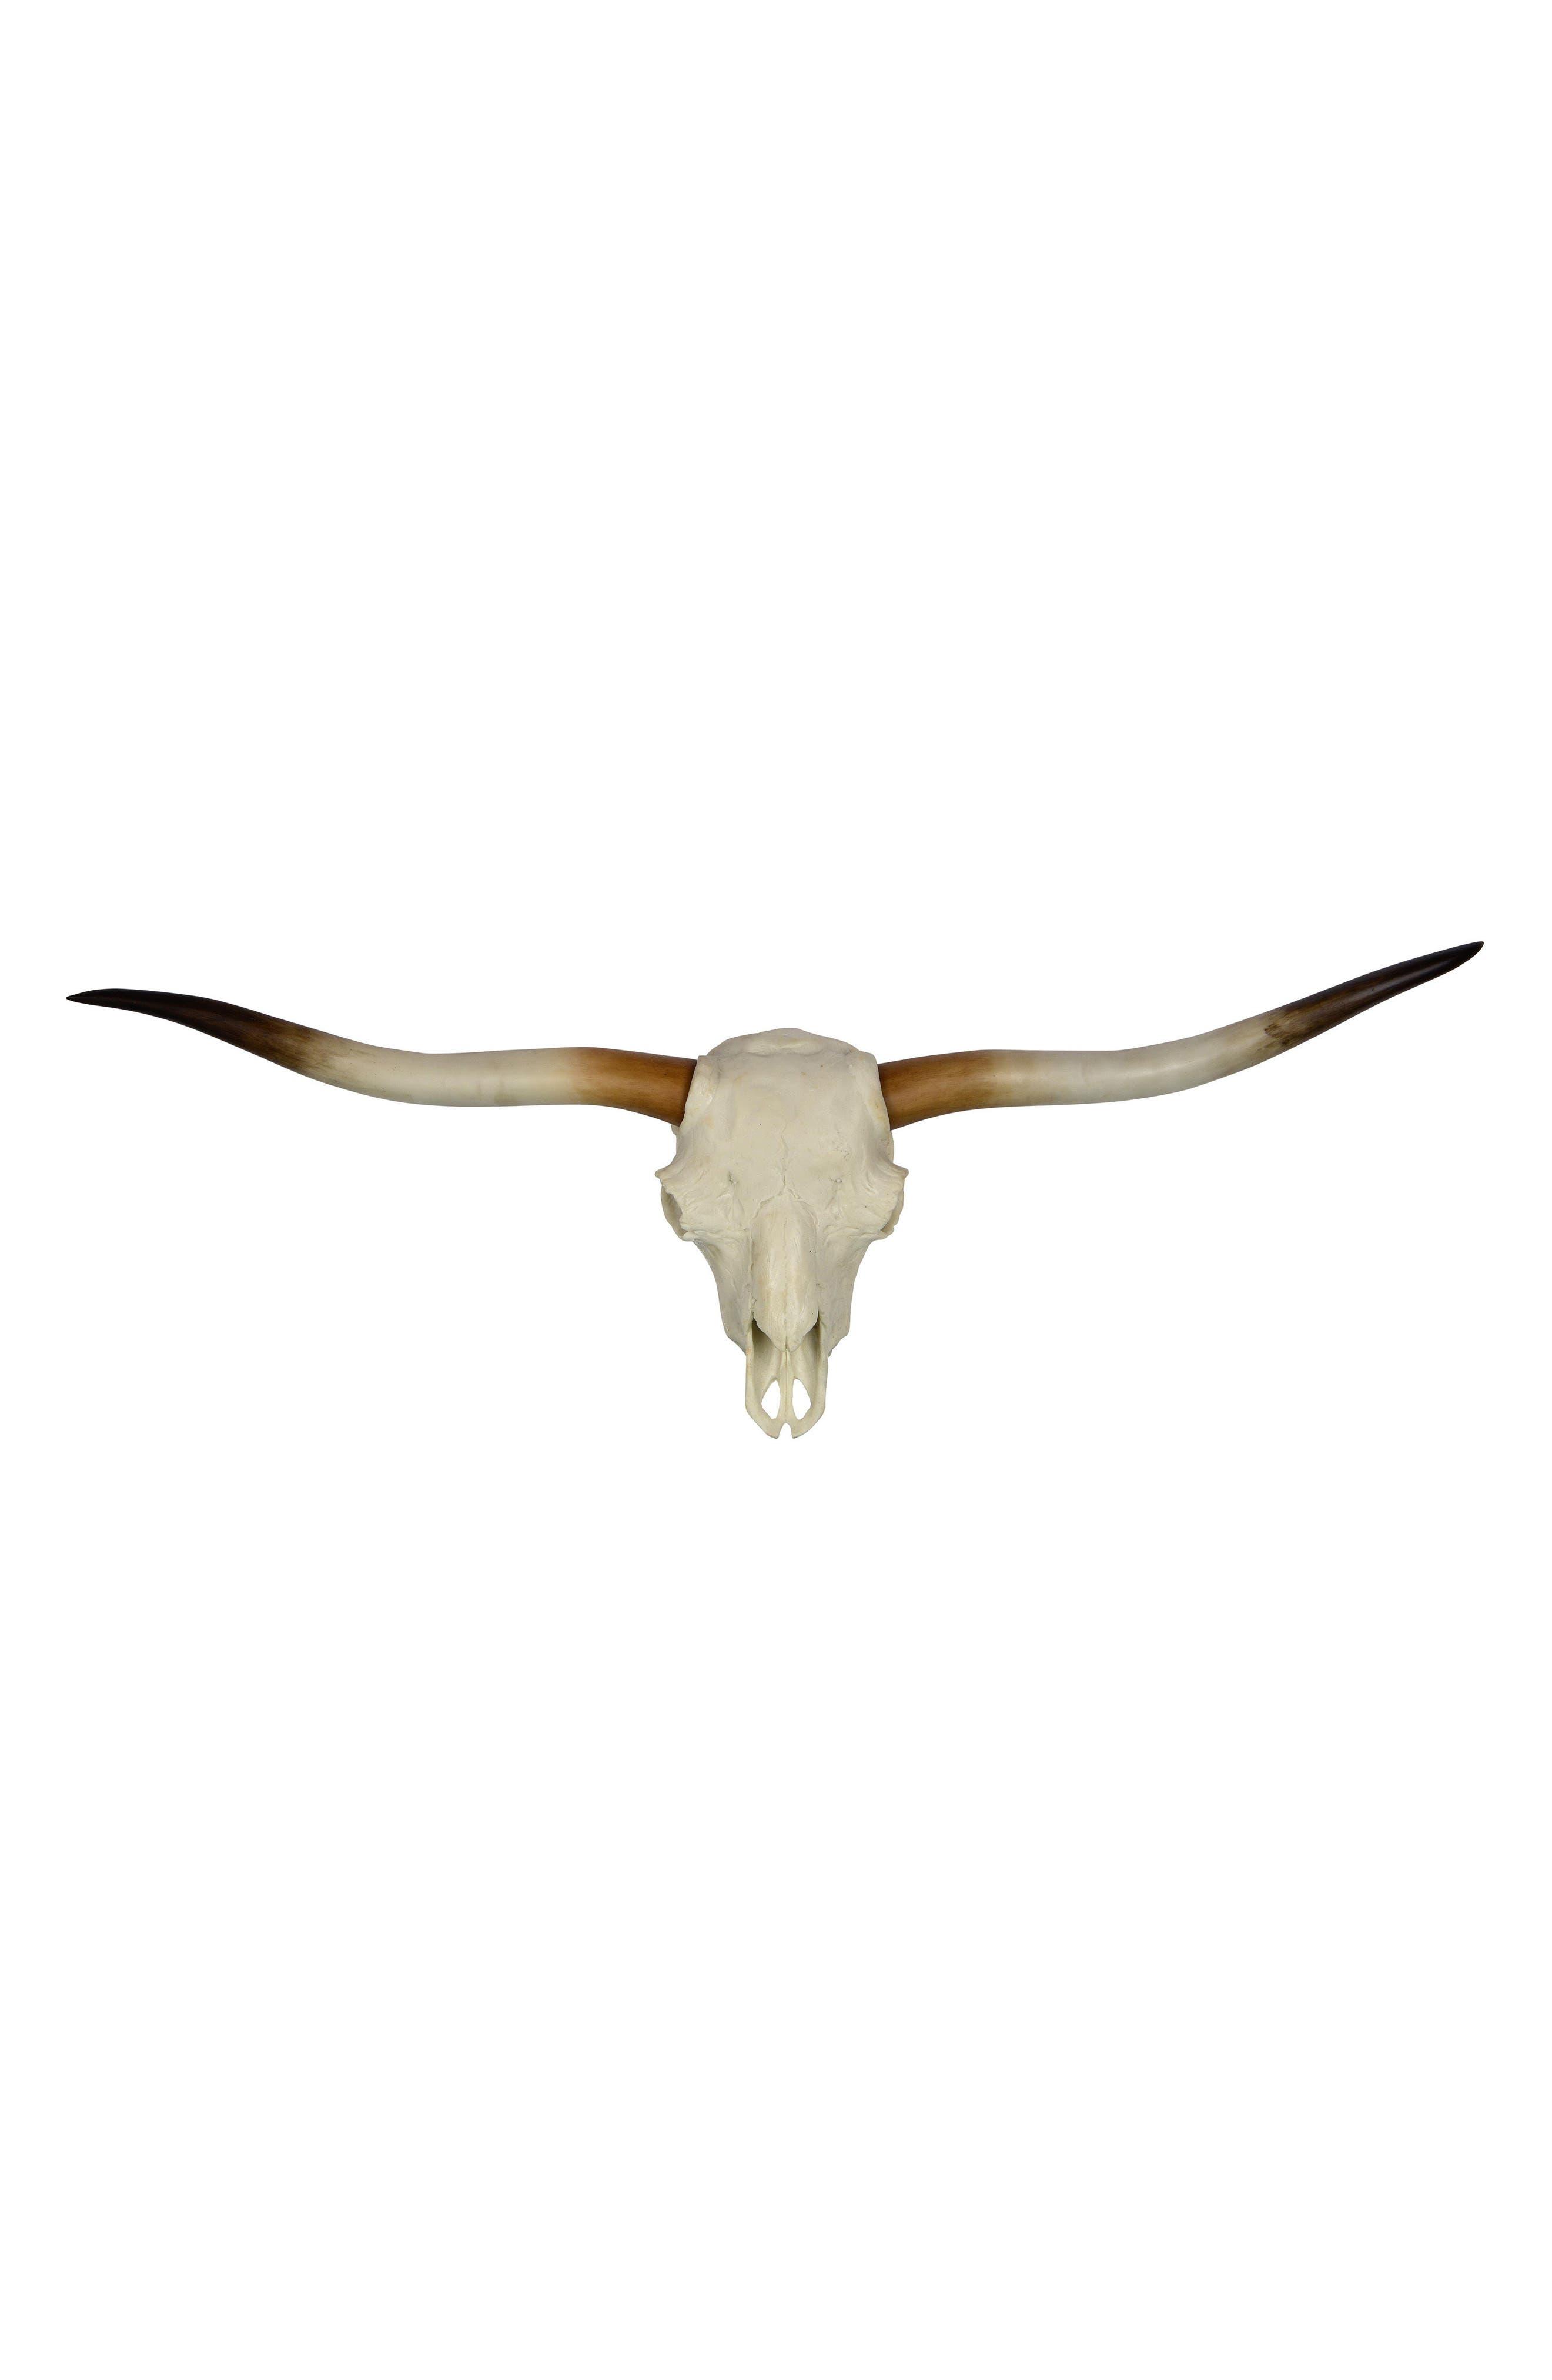 Alternate Image 1 Selected - Renwil Resin Longhorn Skull Wall Ornament